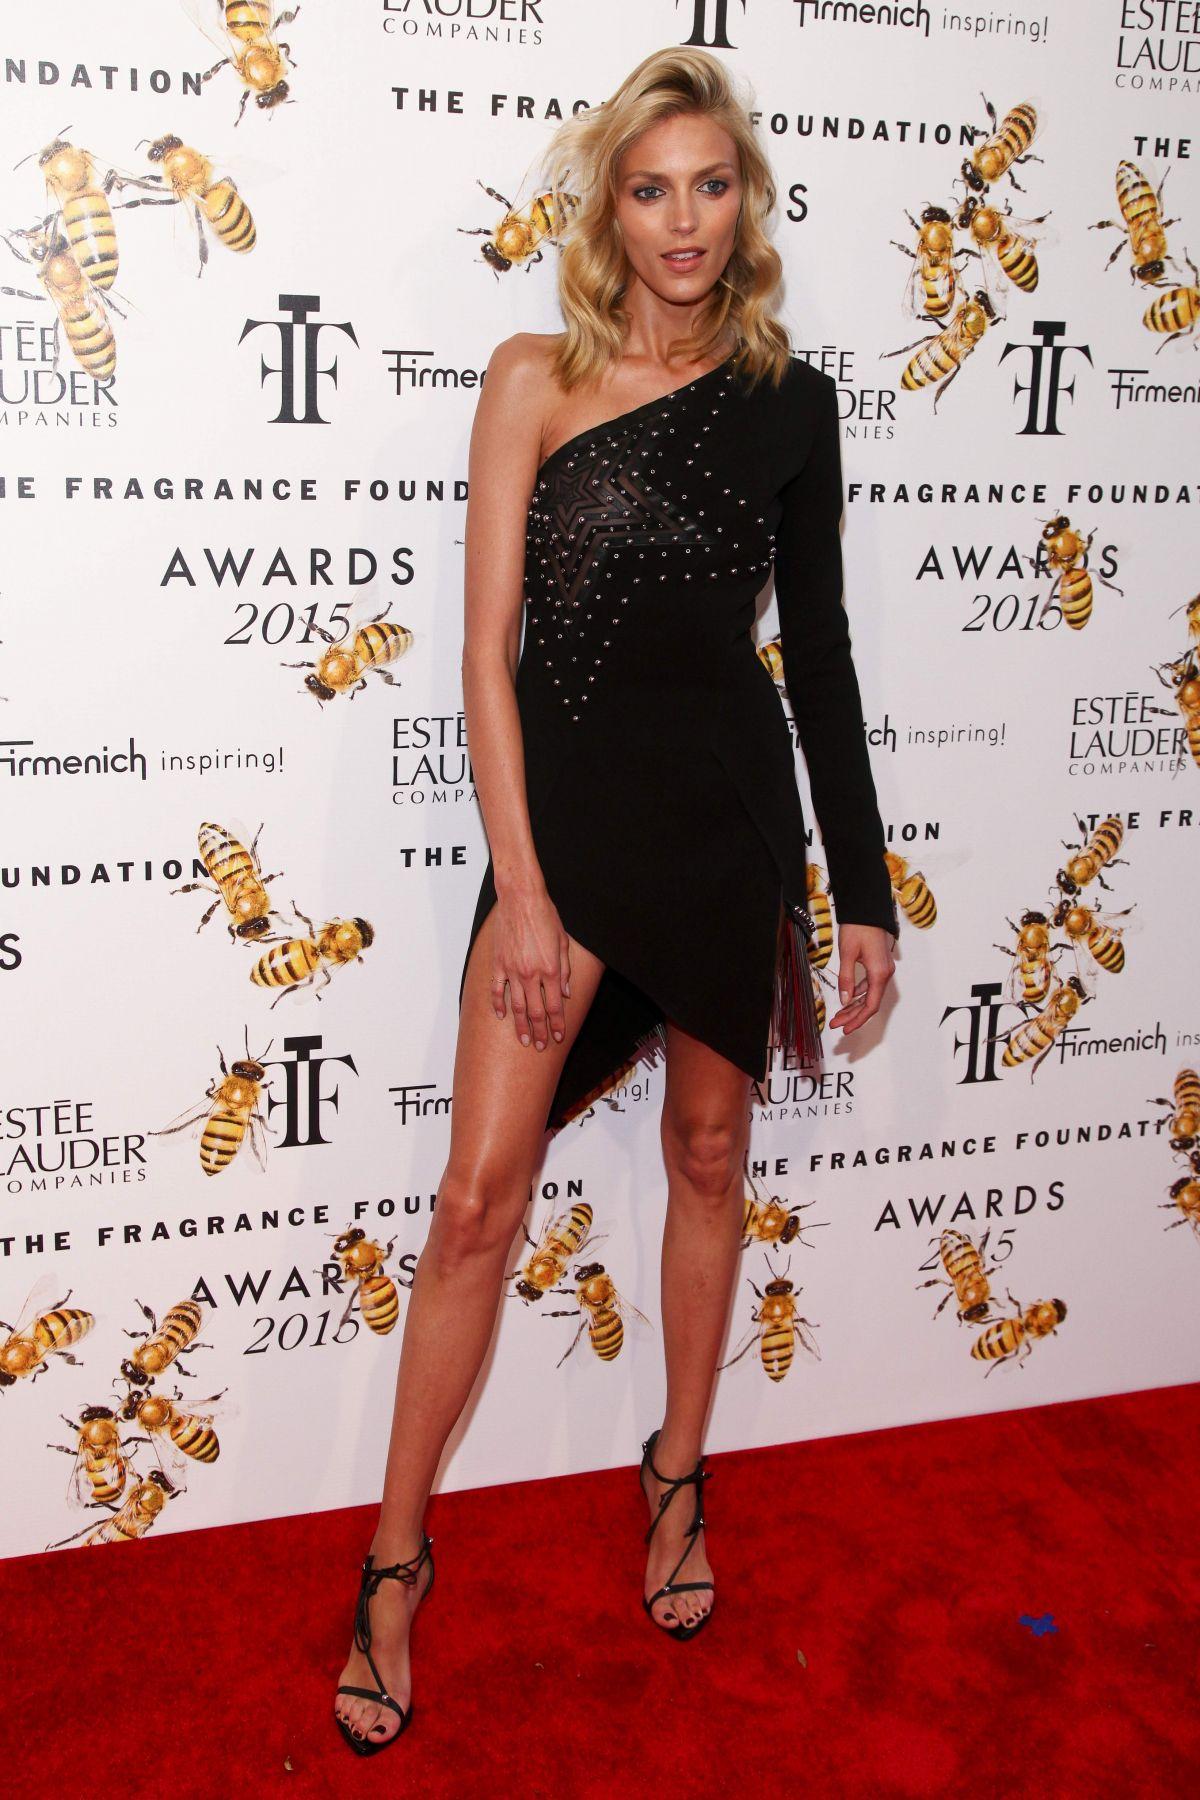 ANJA RUBIK at 2015 Fragrance Foundation Awards in New York